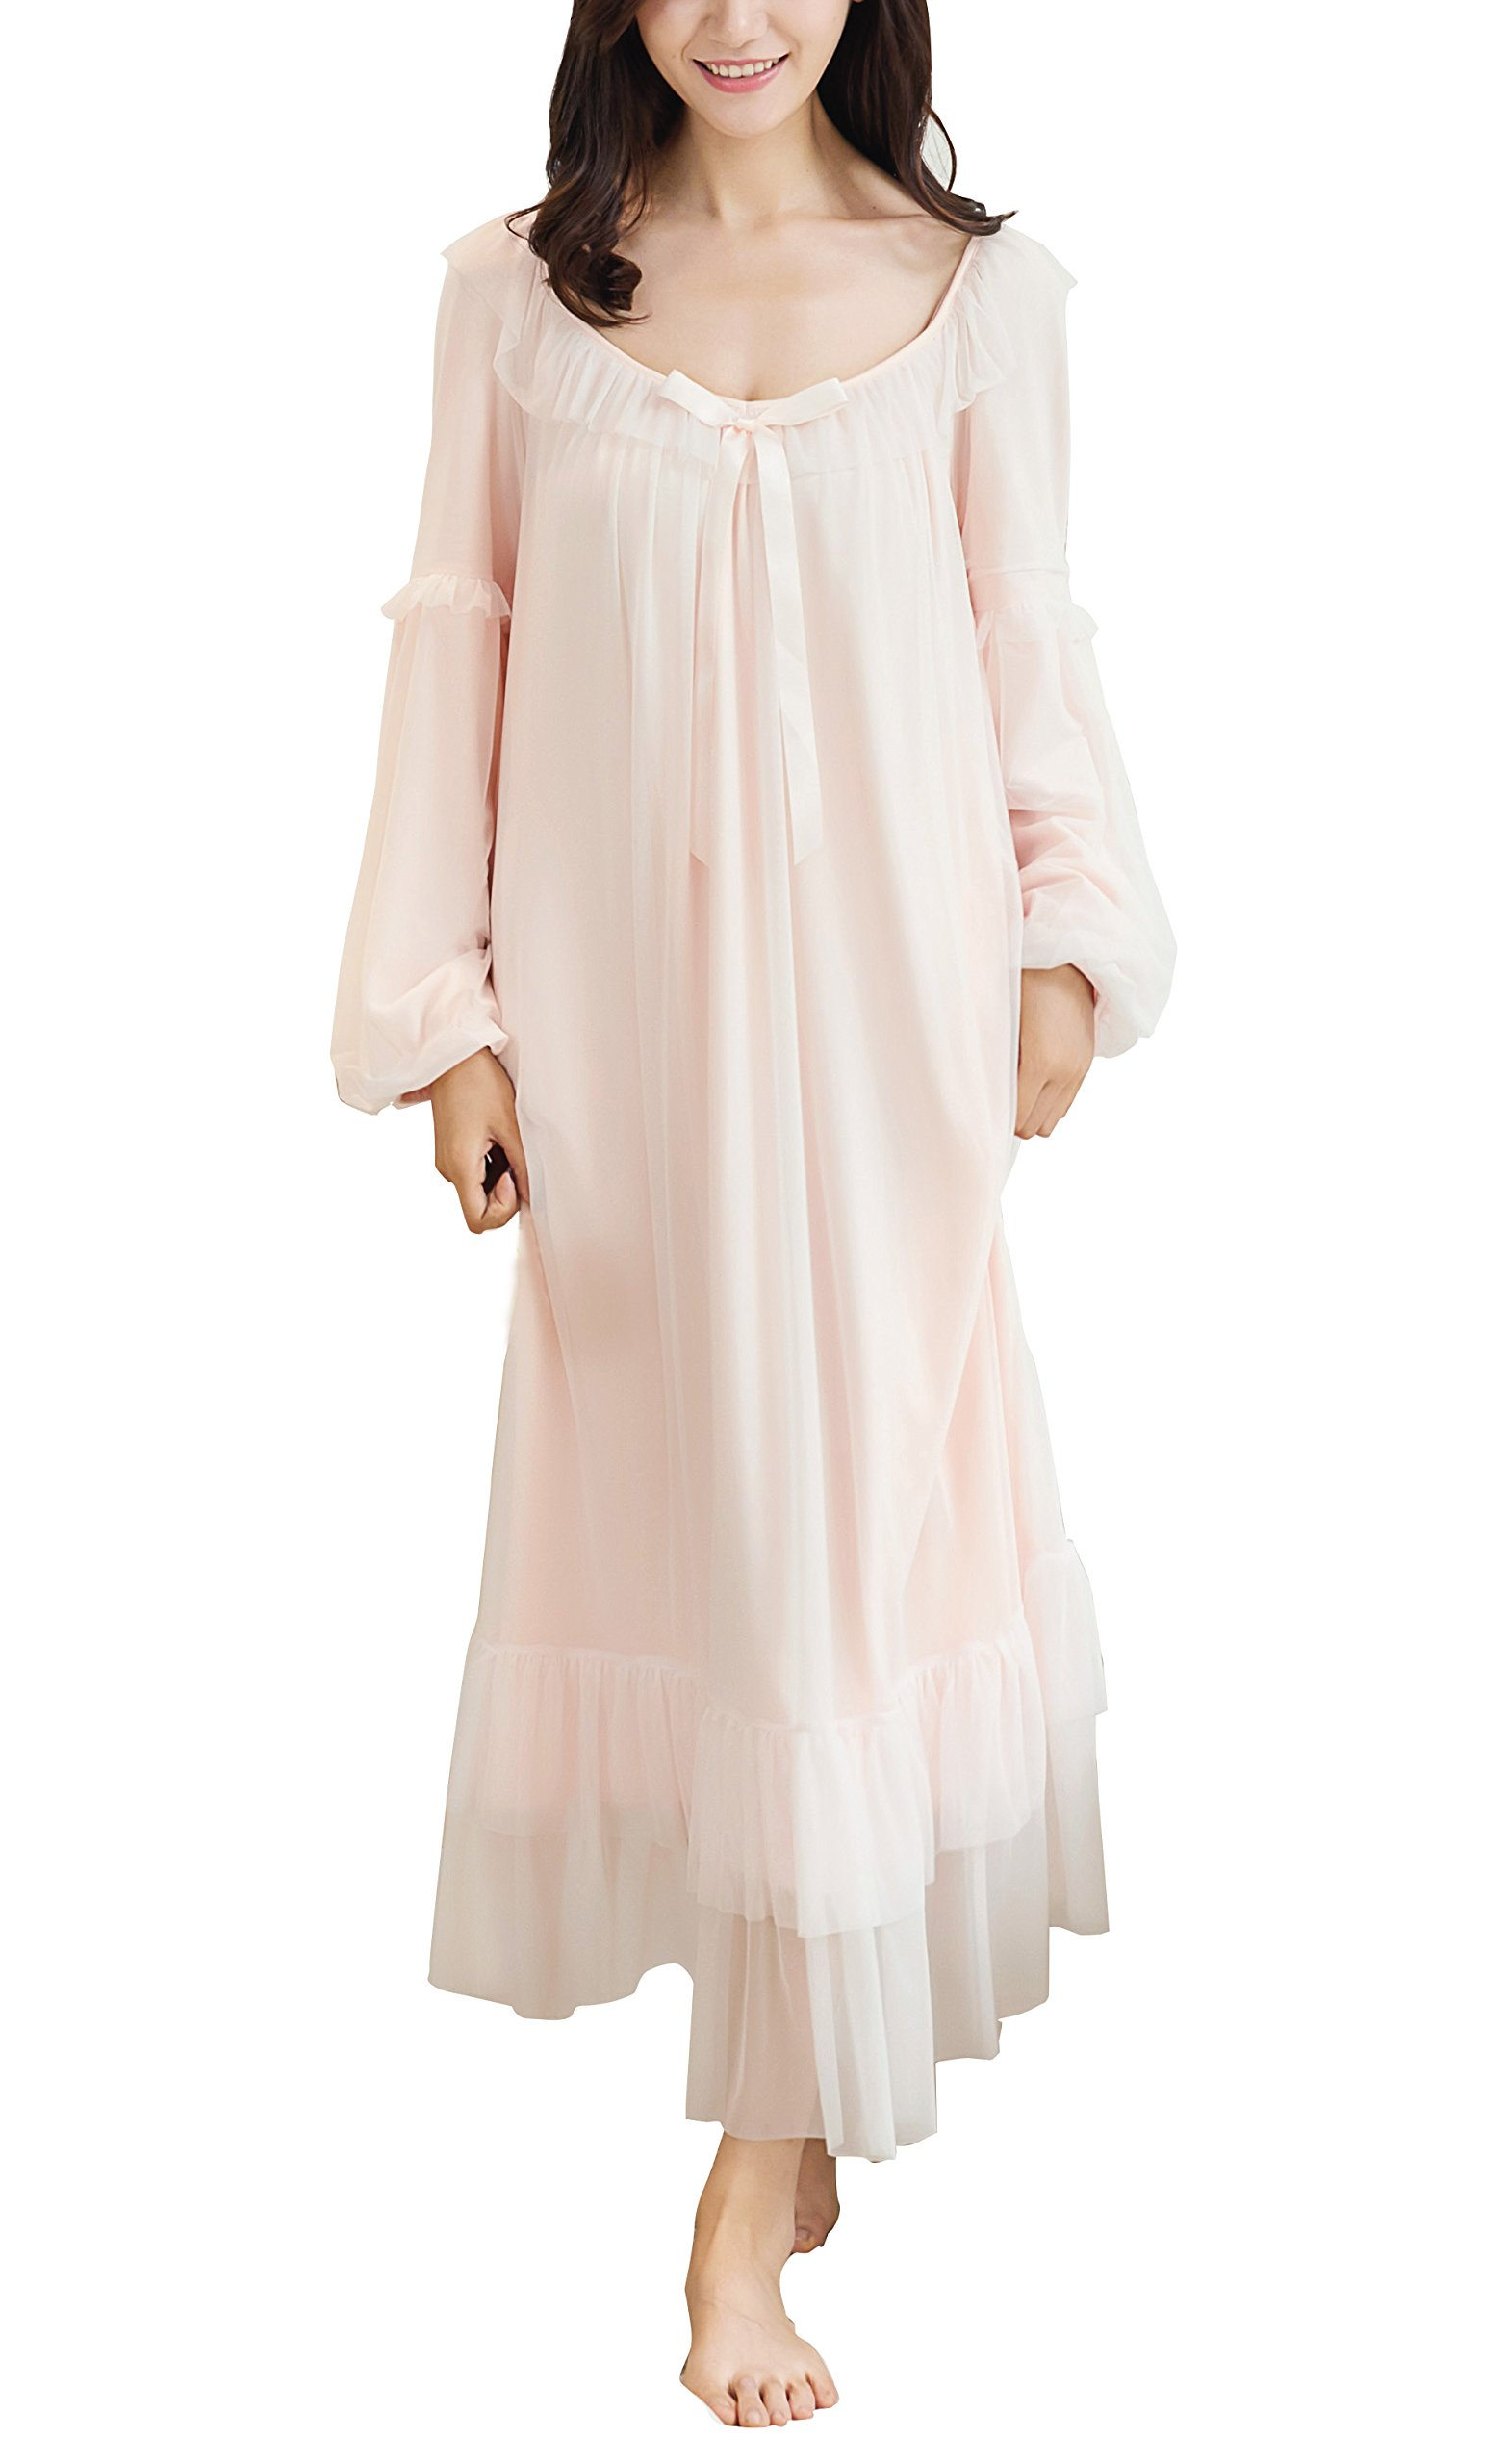 Camellia12 Womens Victorian Style Long Mesh Nightgown,Long Sleeve Wedding Nightie Sleepwear